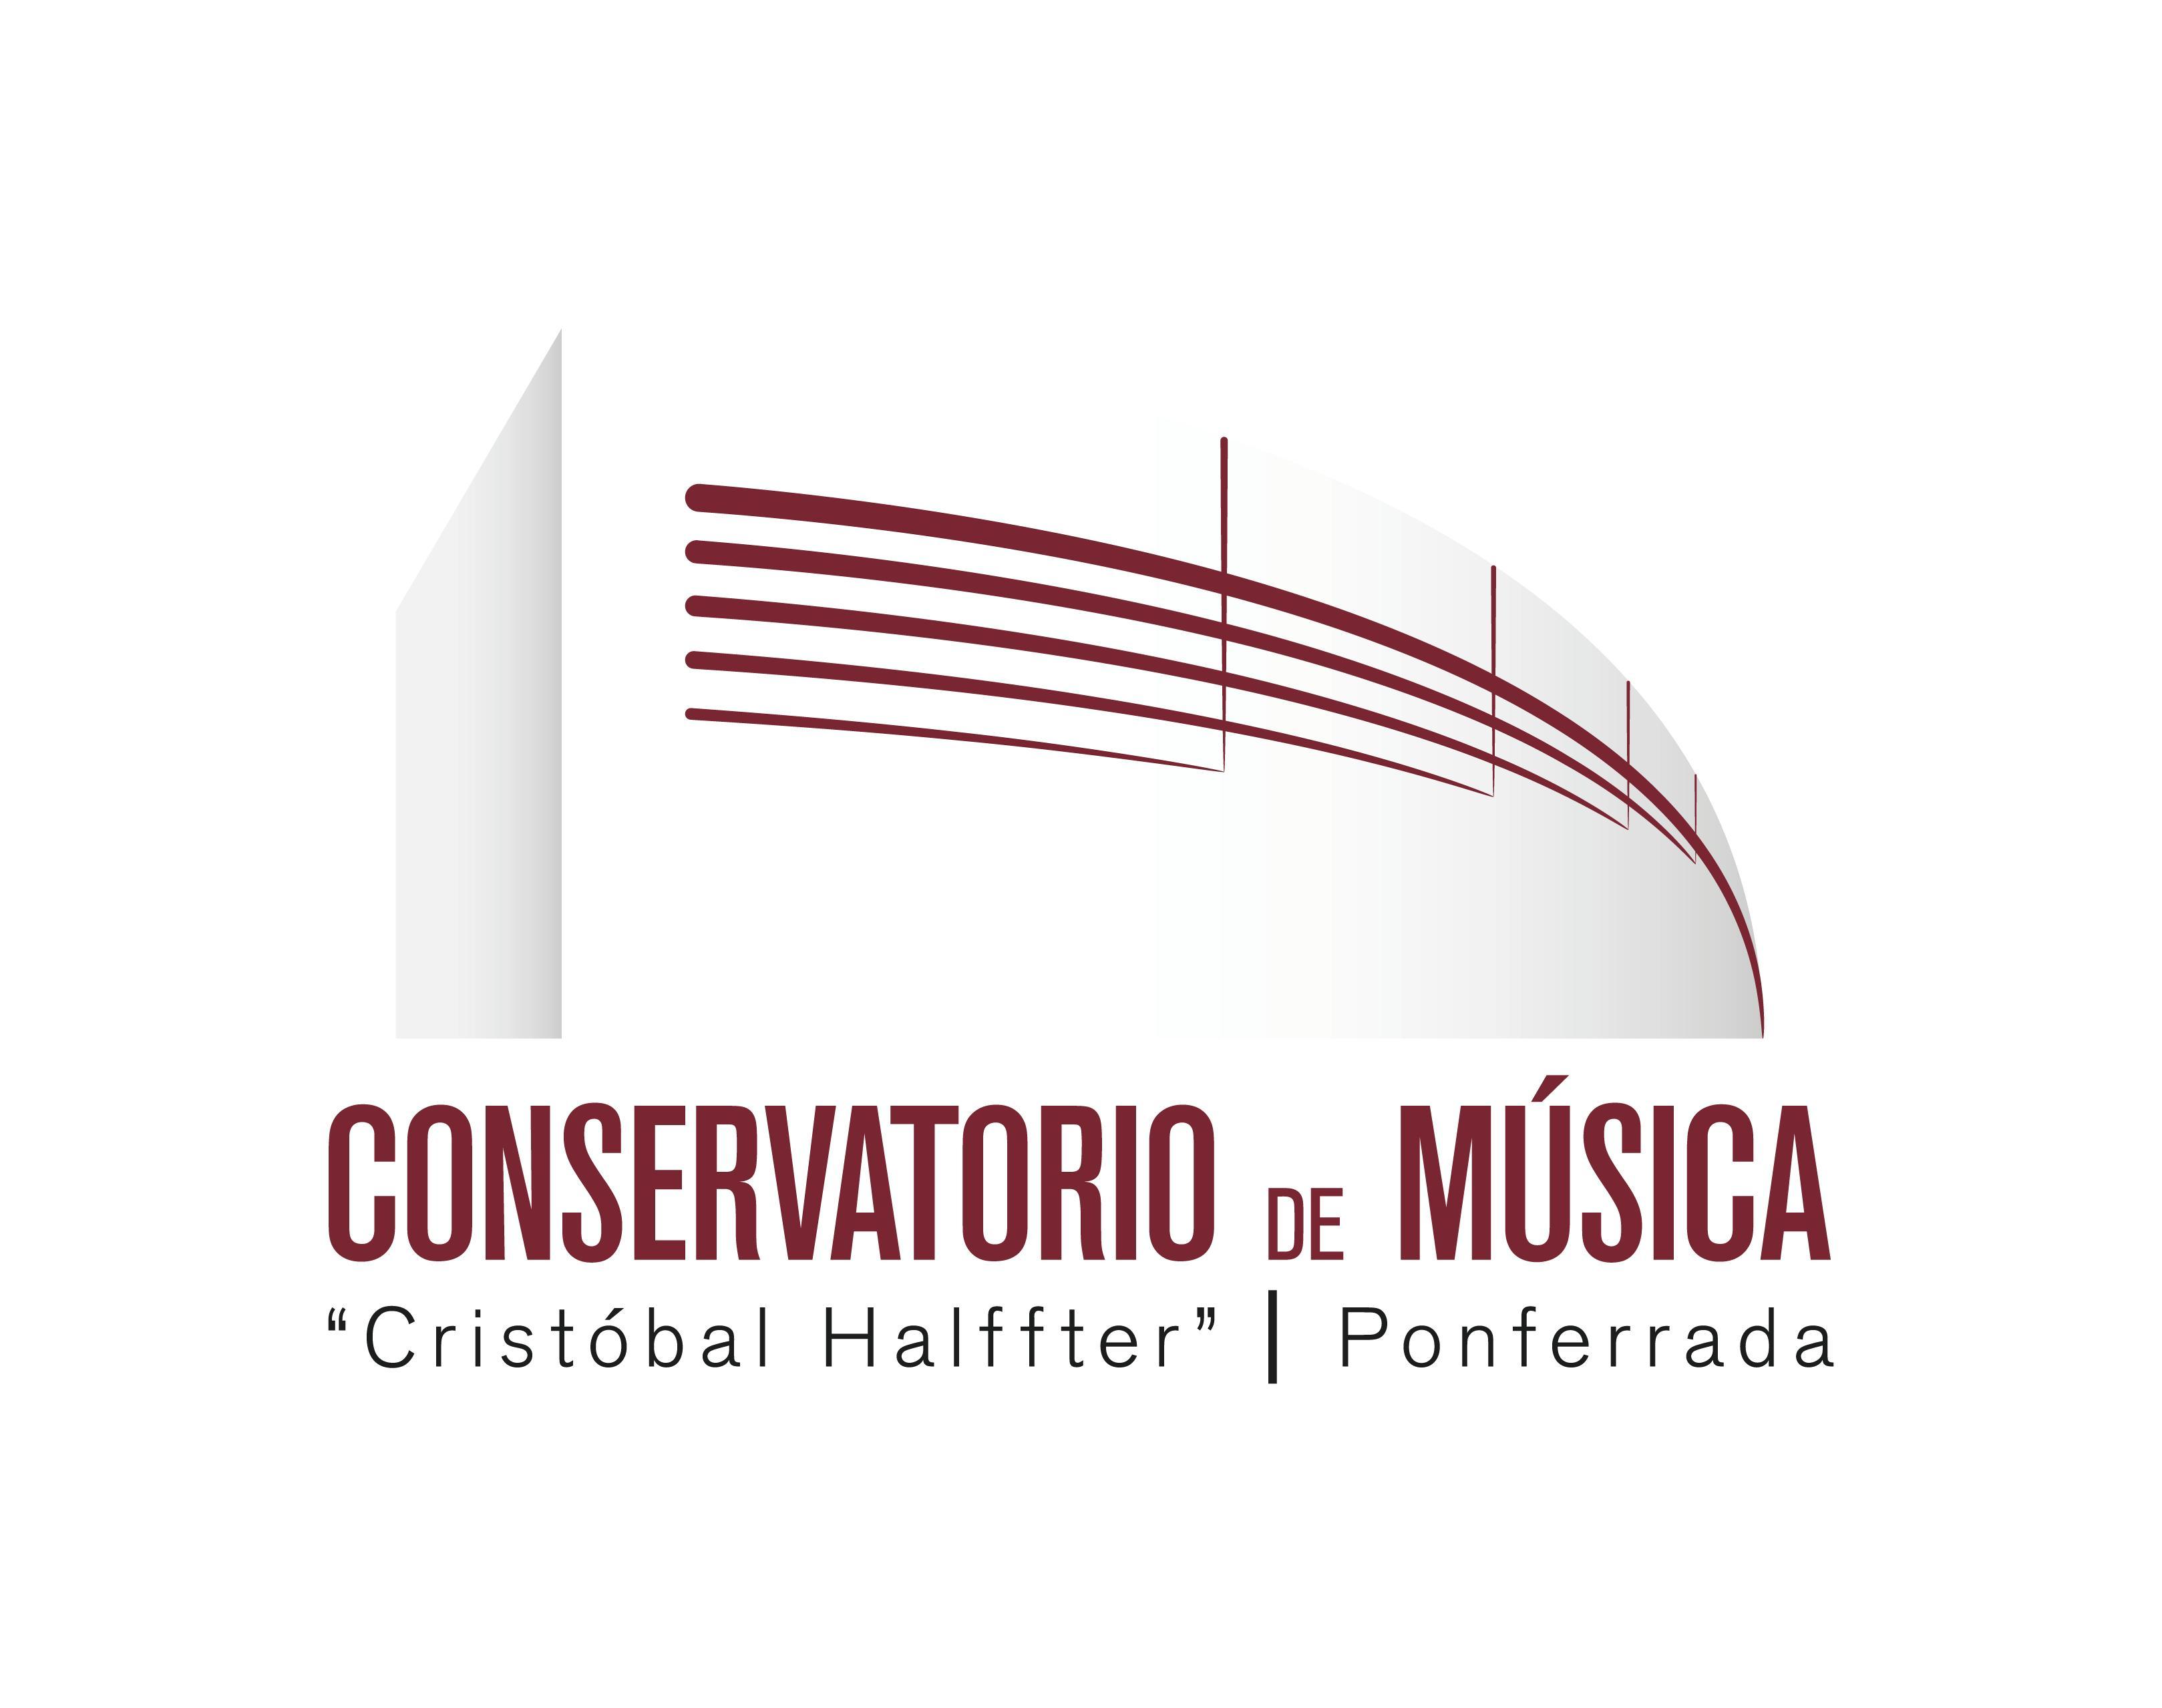 CONCERT OF SANTA CECILIA